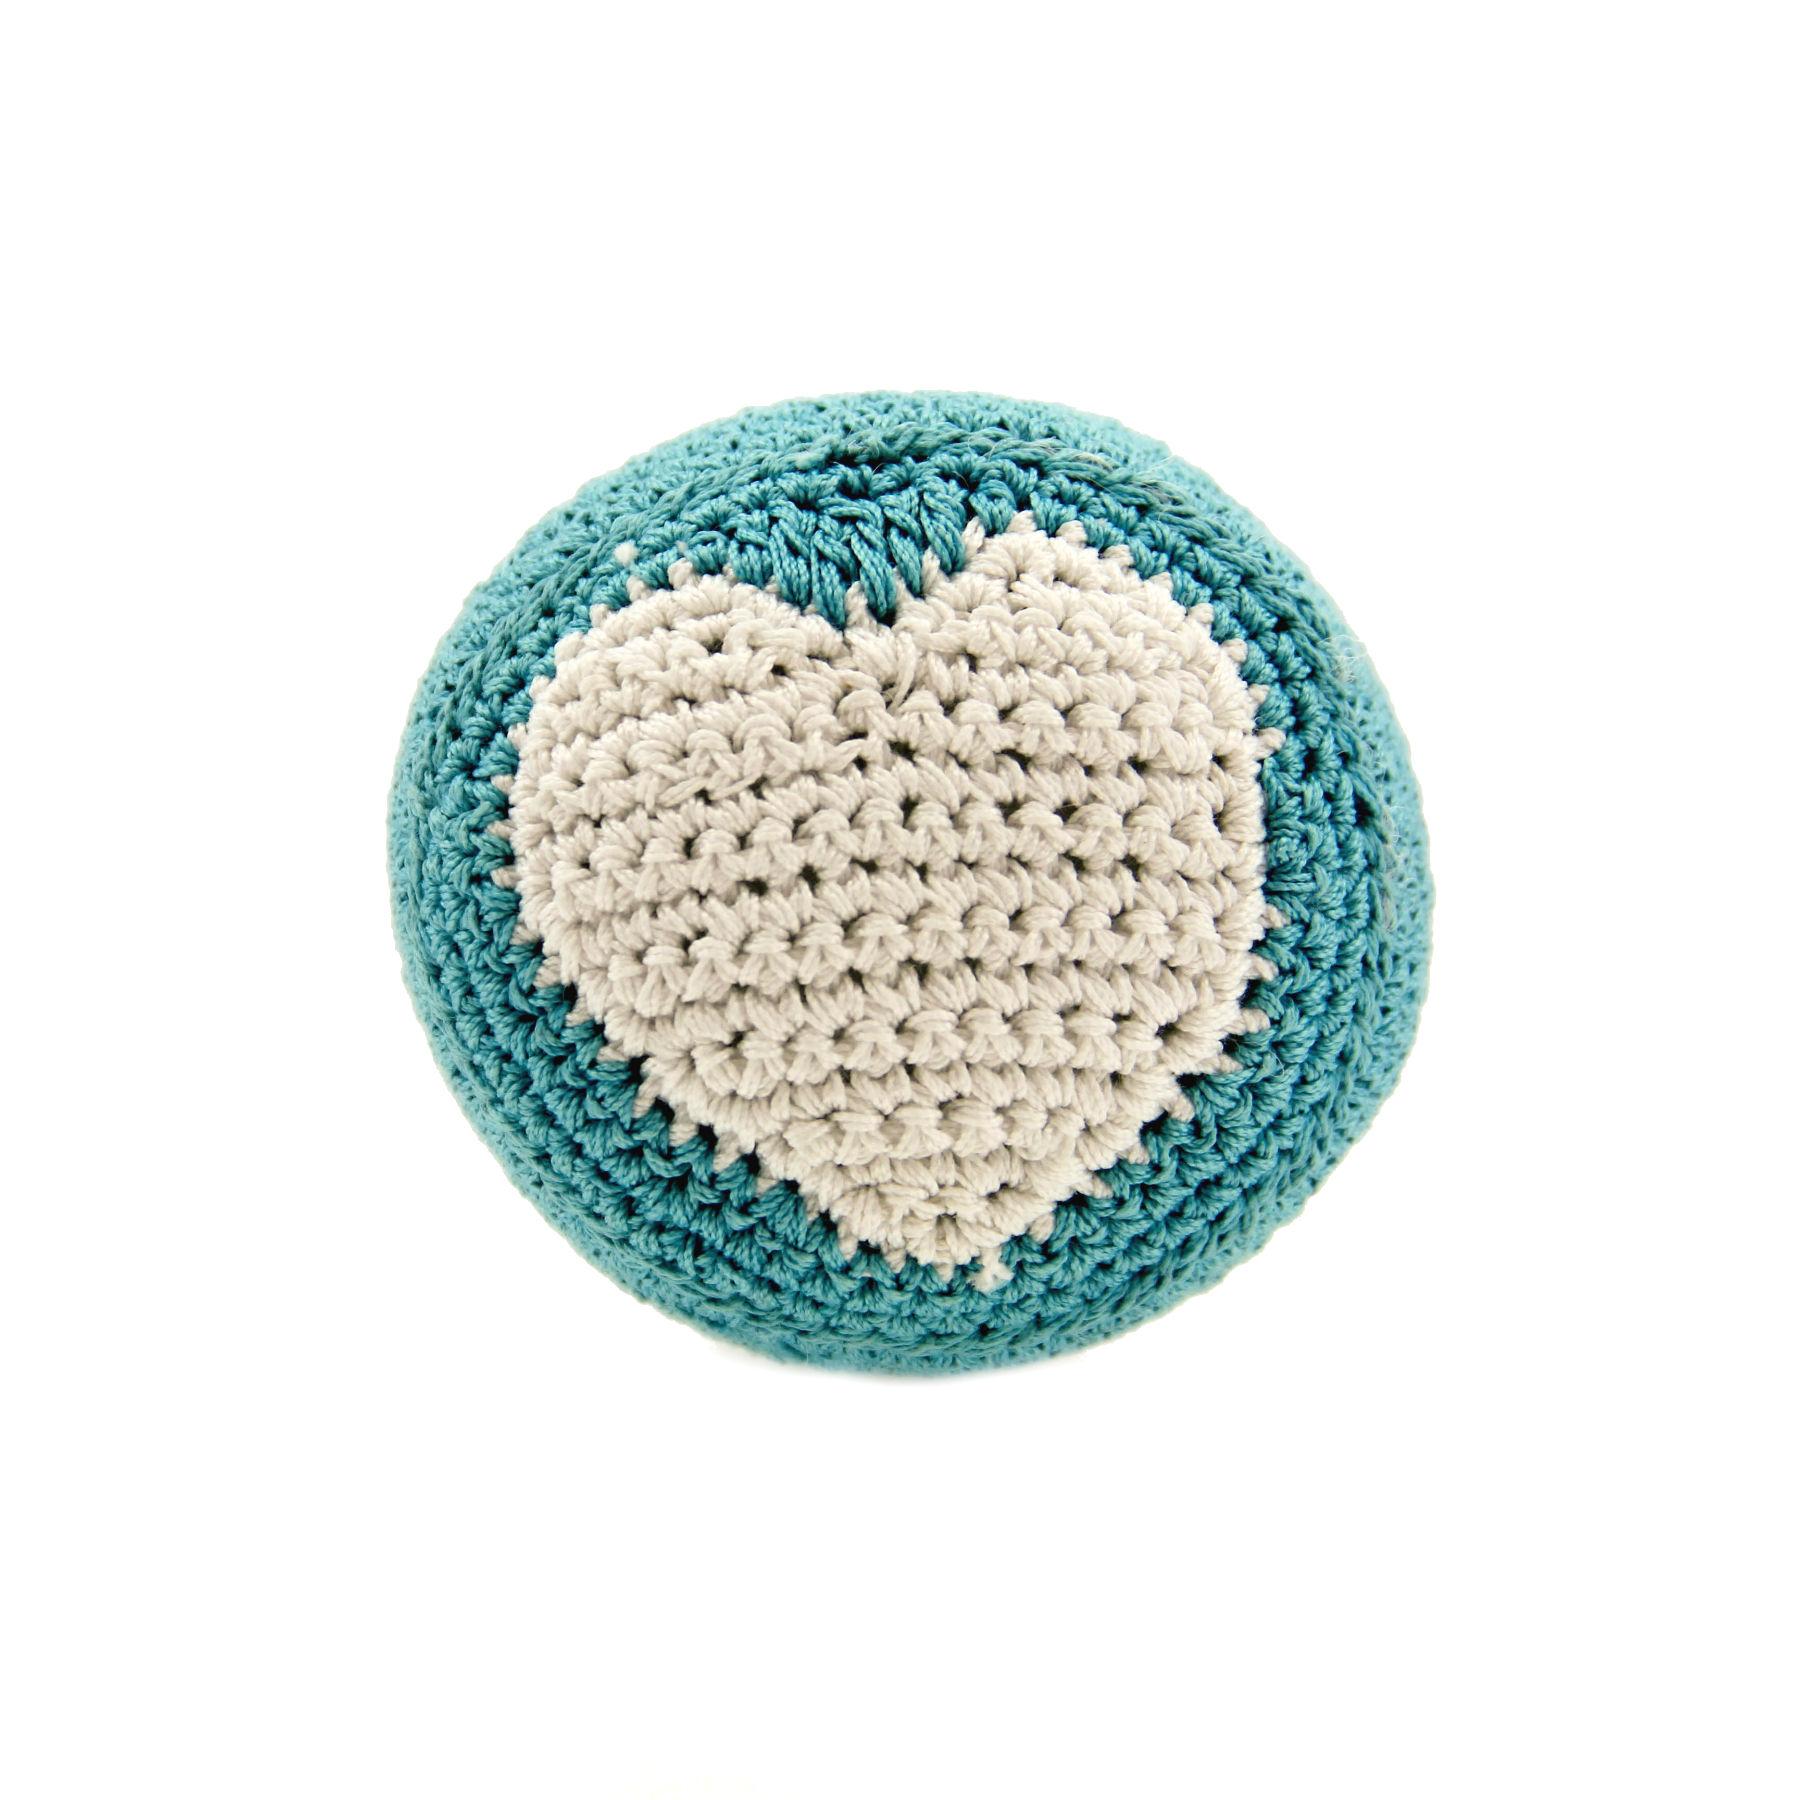 Organic Cotton Crochet Dog Toy by Hip Doggie - Blue Heart Ball